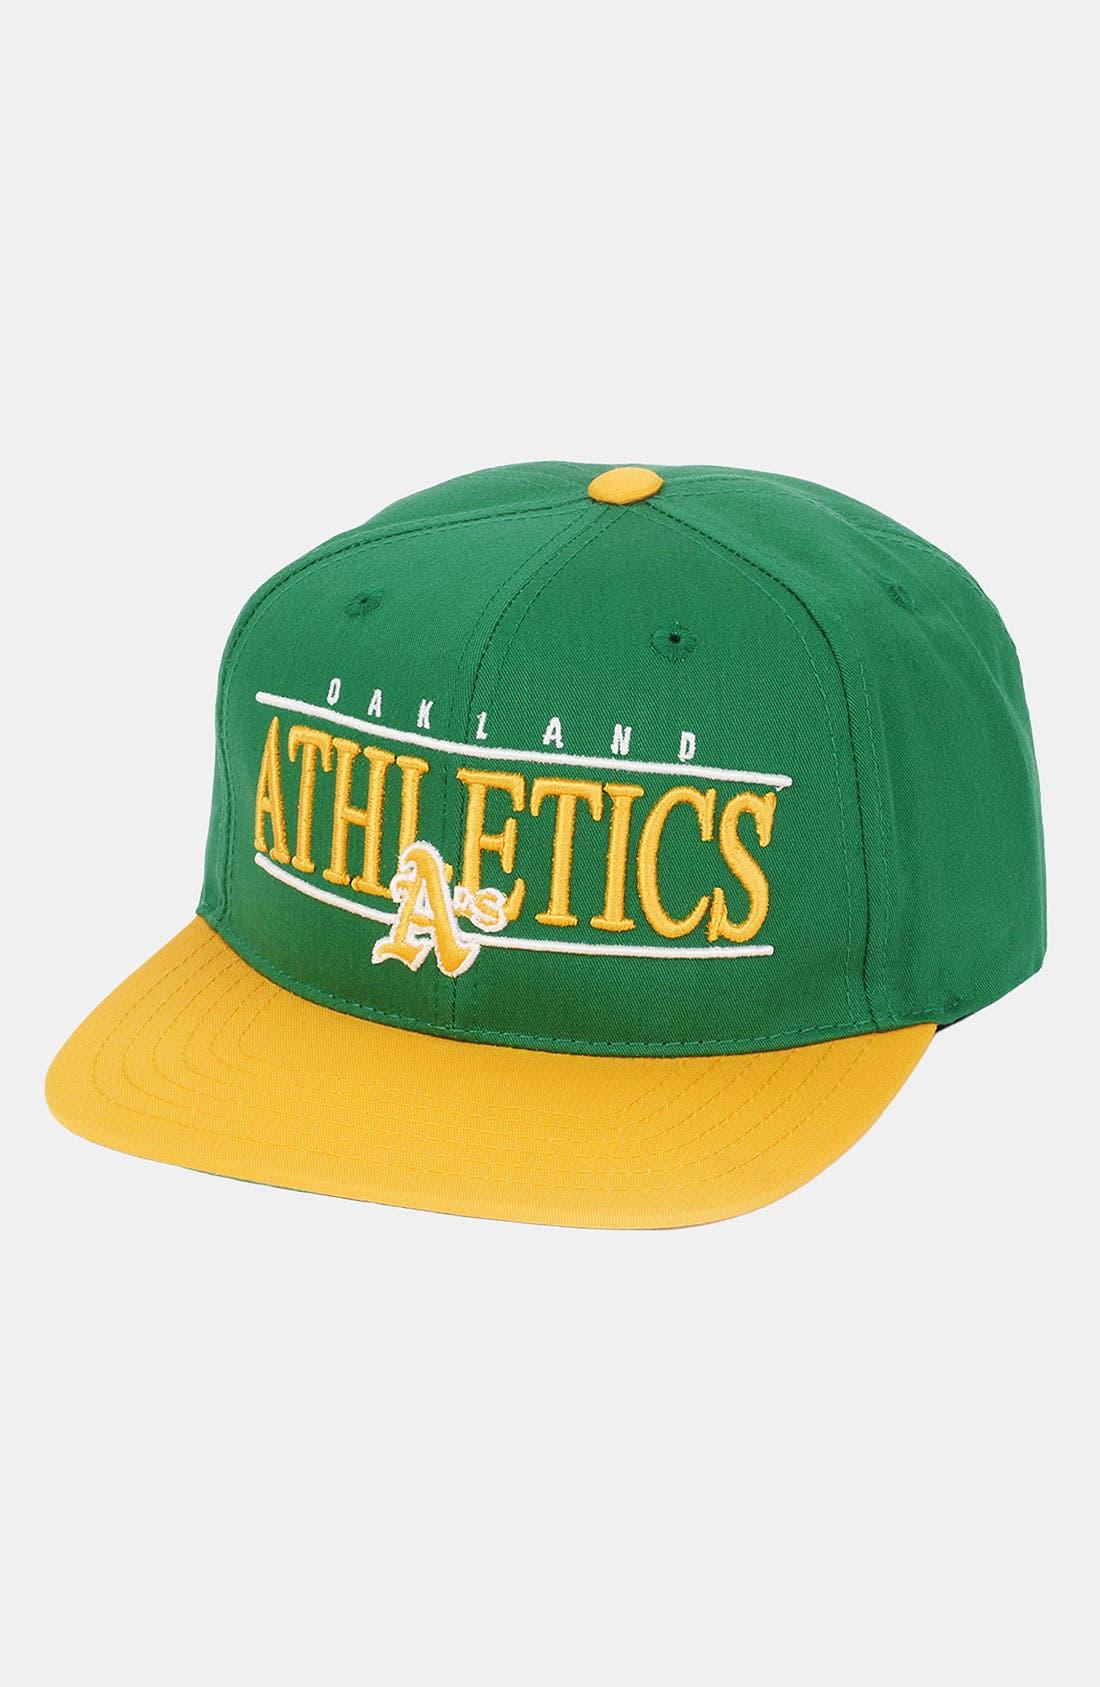 Alternate Image 1 Selected - American Needle 'Oakland Athletics - Nineties' Twill Snapback Baseball Cap